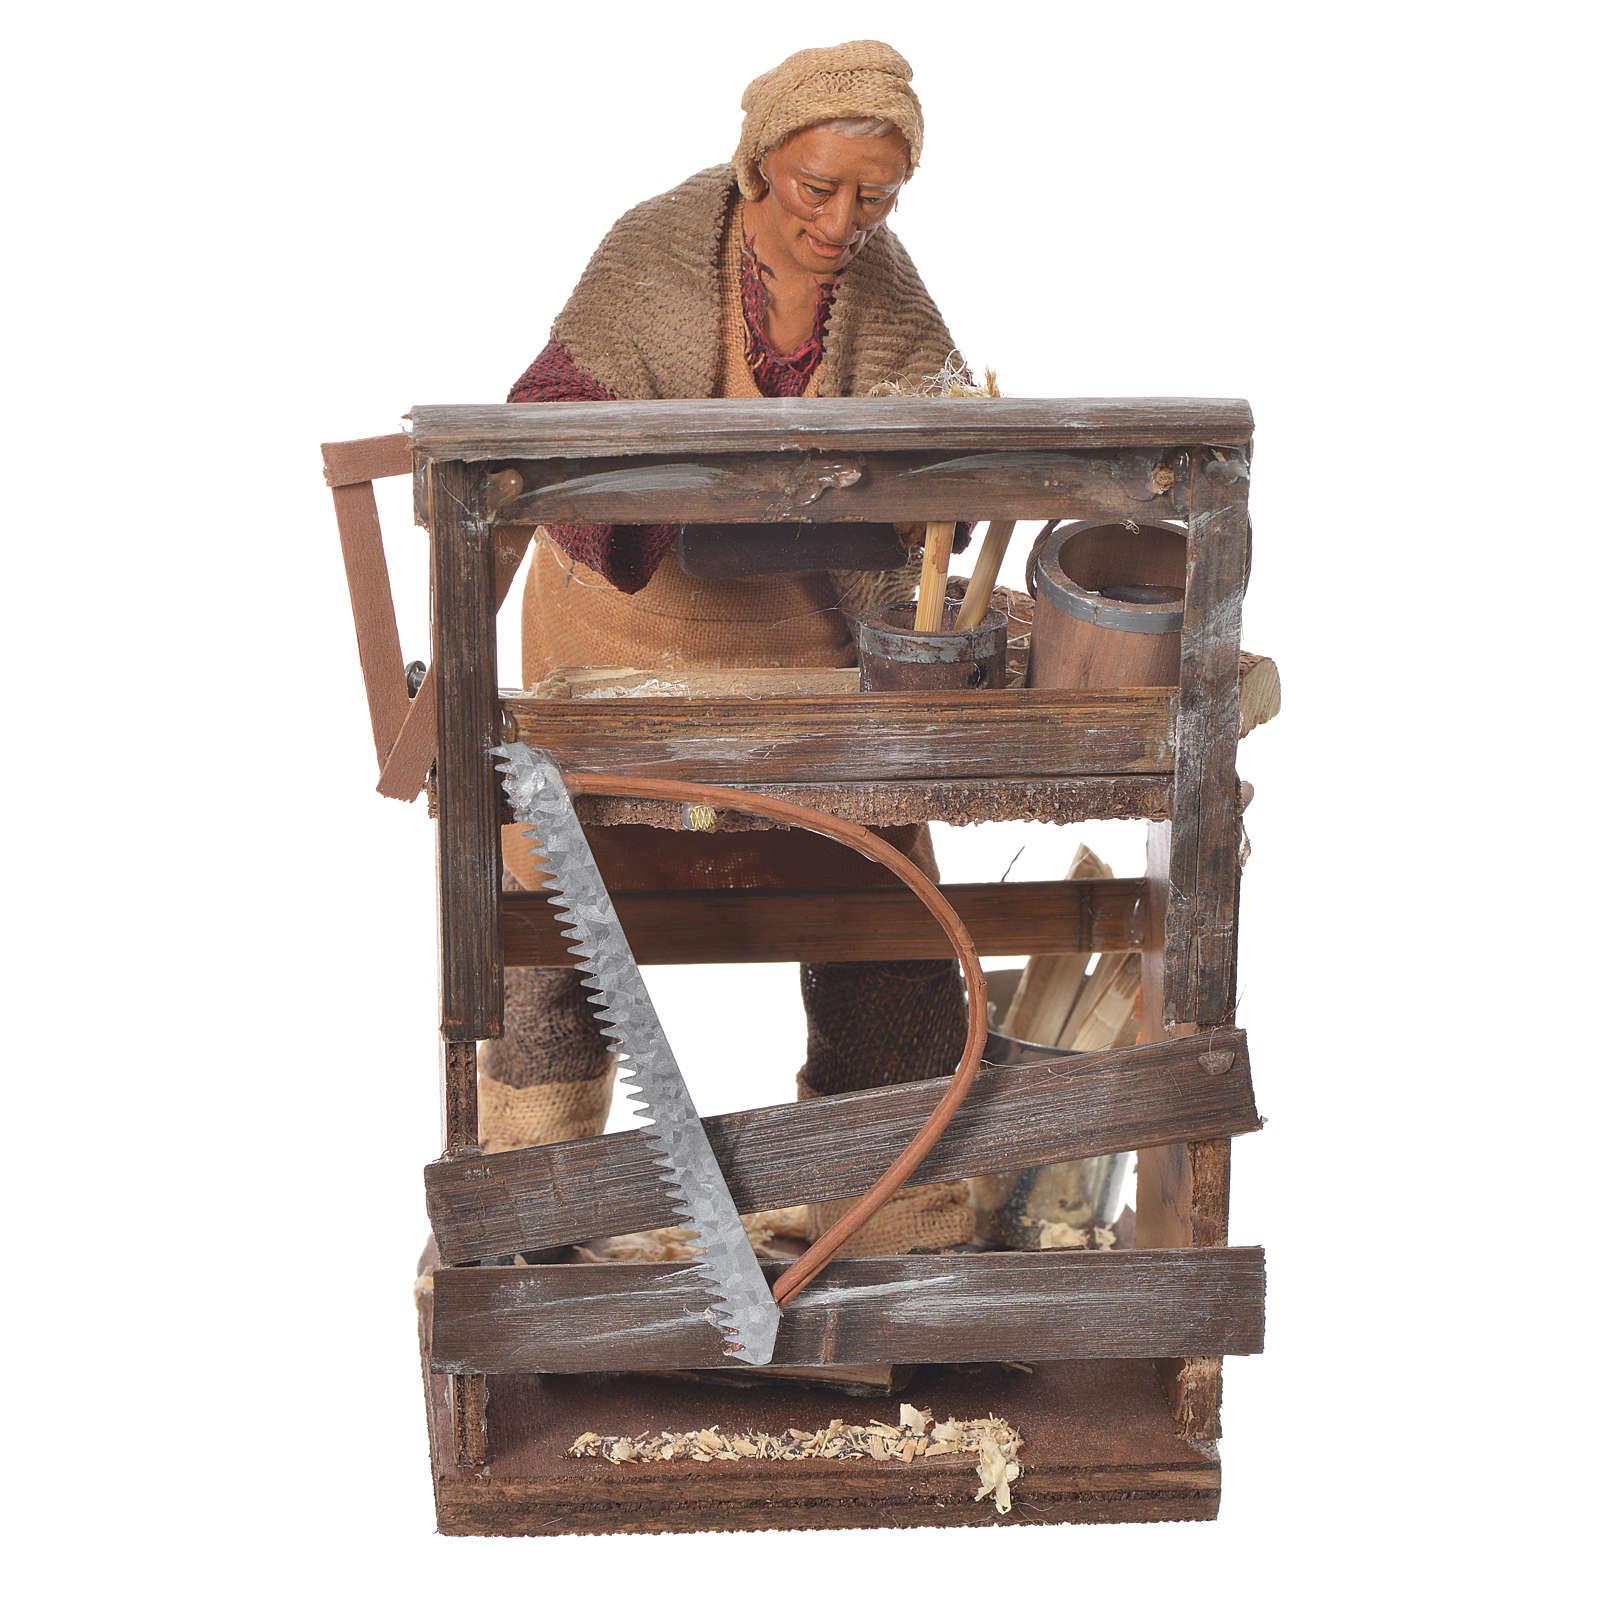 Carpenter with plane, Neapolitan Nativity 14cm 4